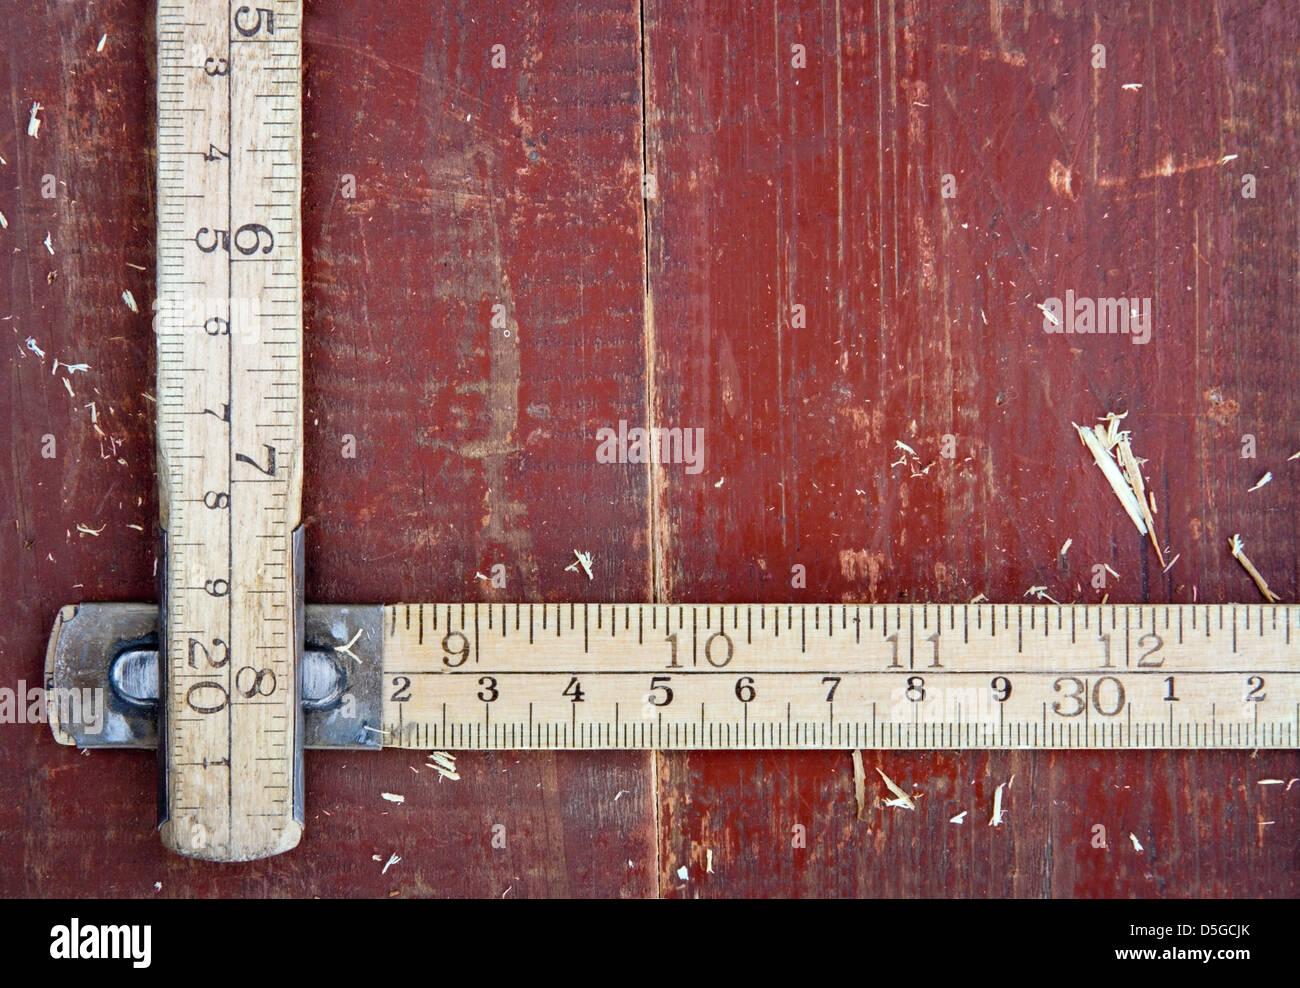 Old wooden meter stick on vintage red wooden background - DIY concept - Stock Image